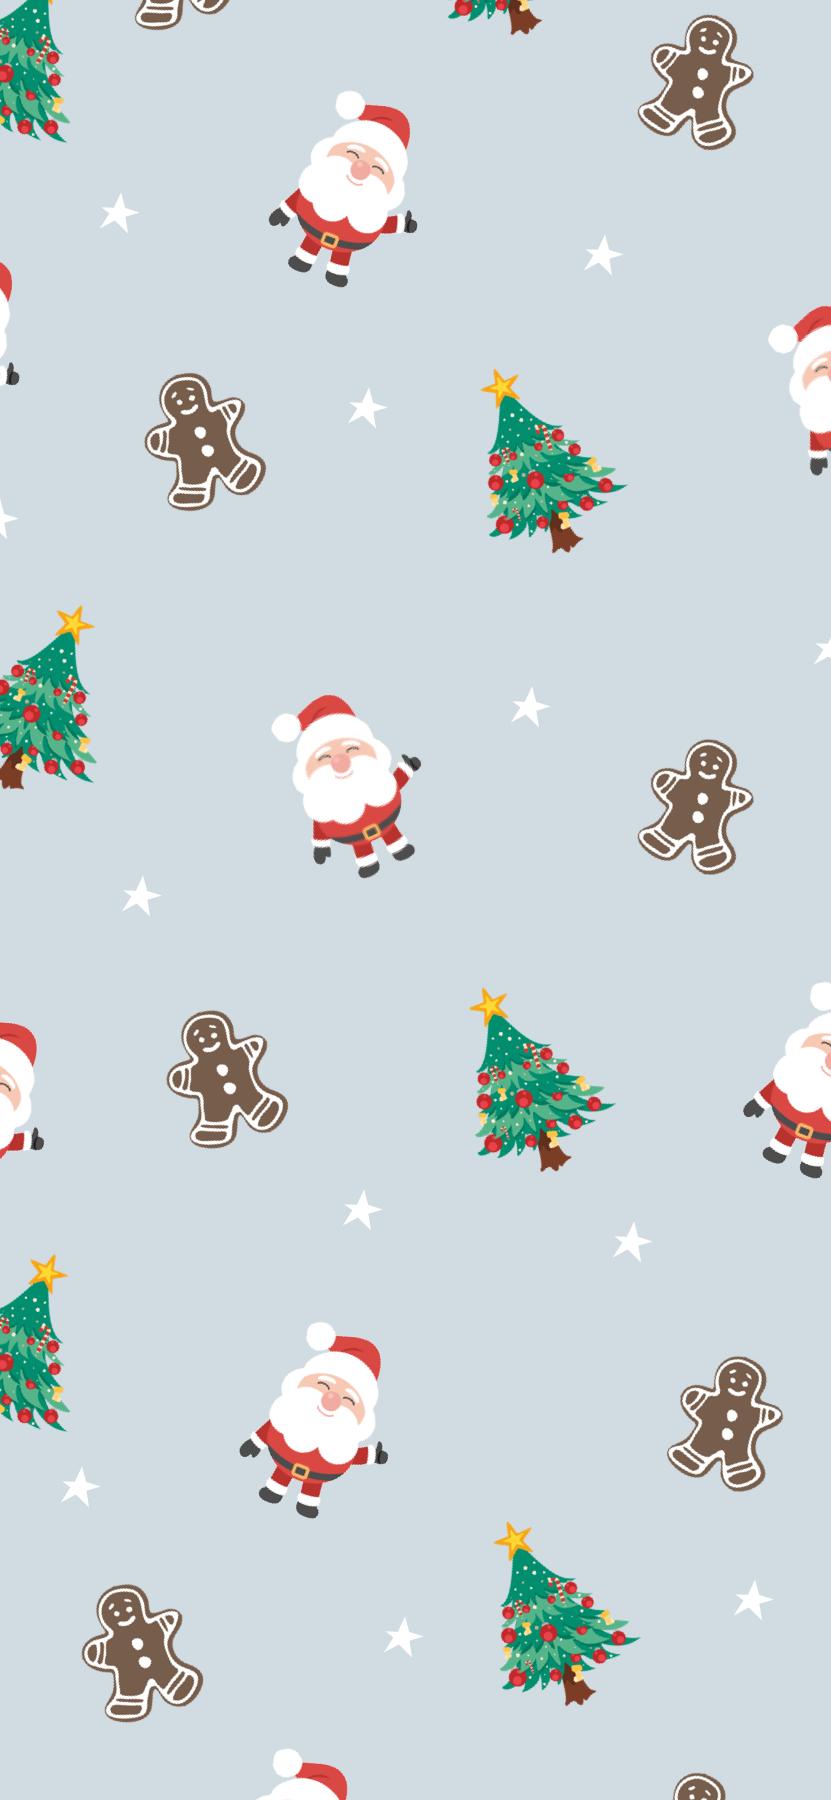 Festive Ornament Print Greetabl Christmas Phone Wallpaper Wallpaper Iphone Christmas Christmas Wallpaper